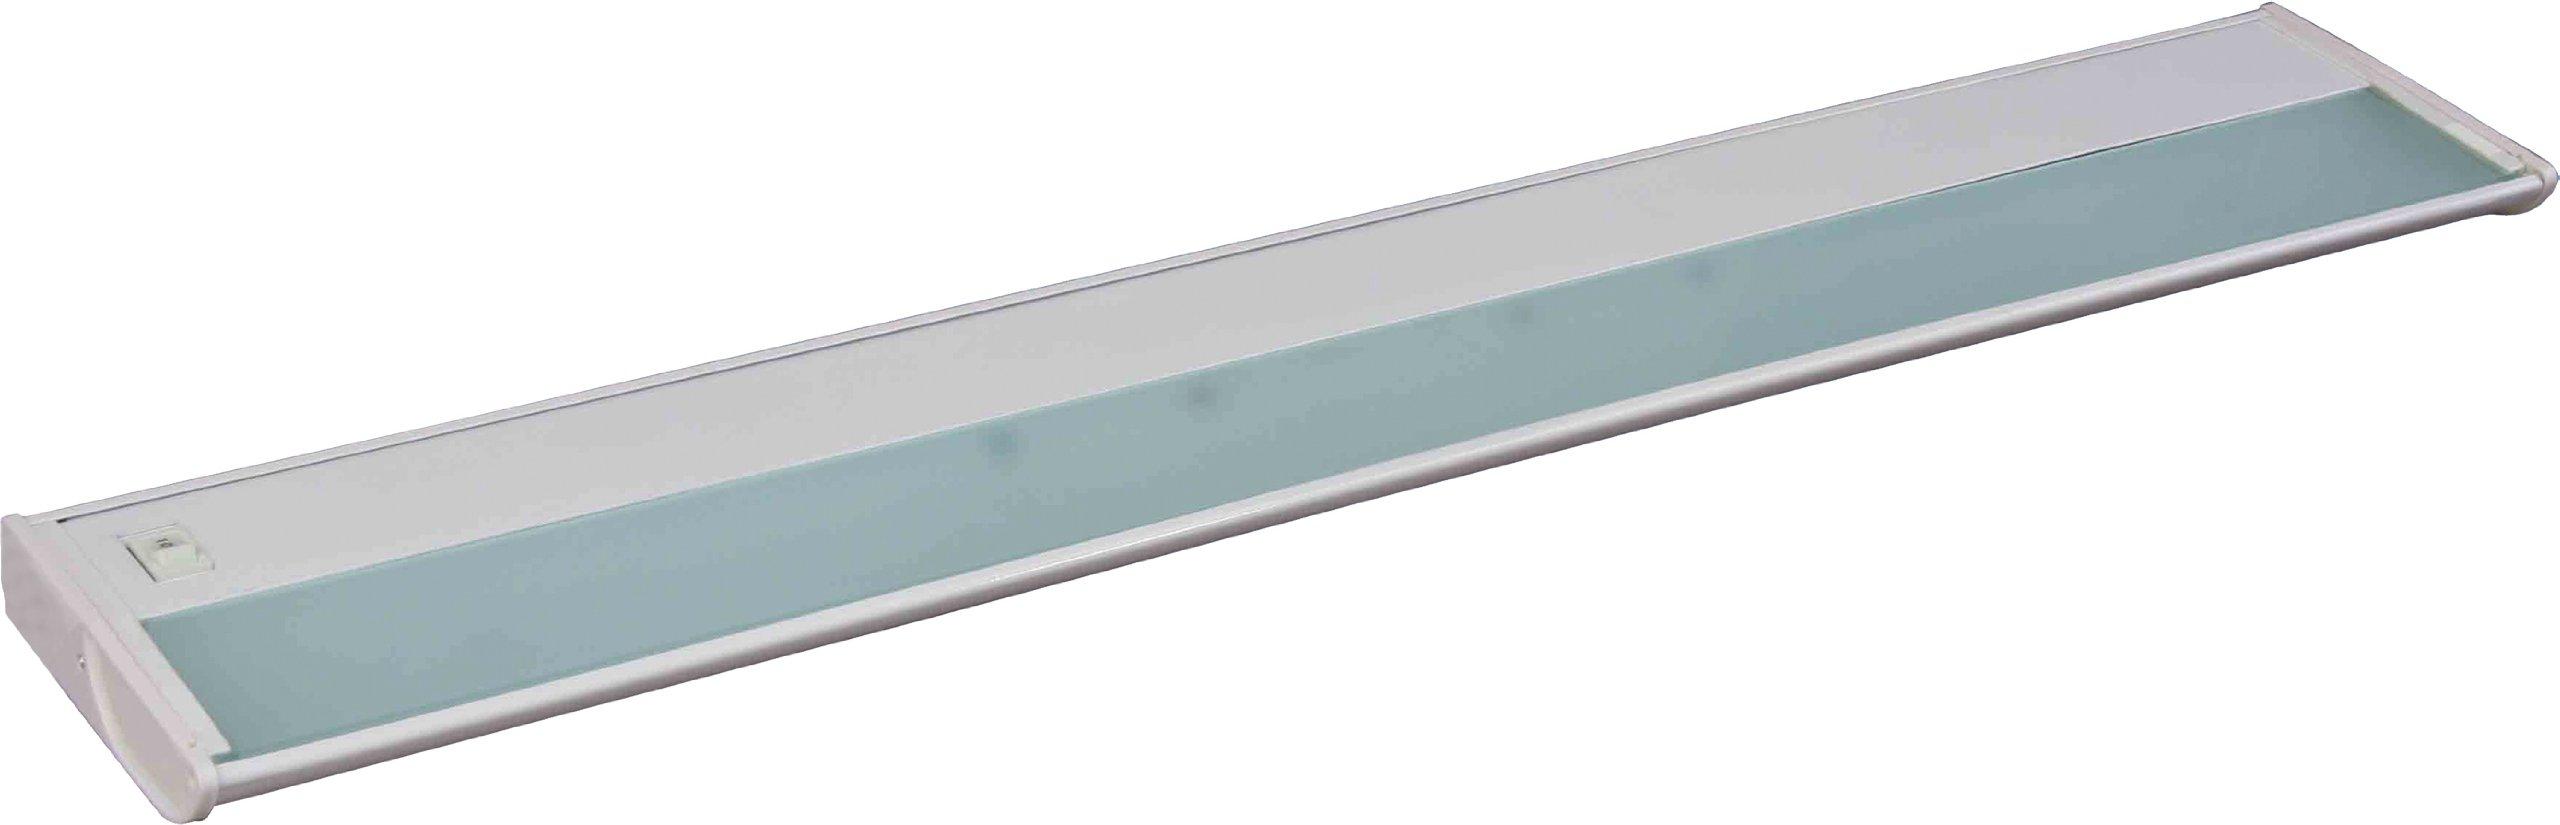 Maxim 87834WT CounterMax MX-X120 40'' 5-Light 120V Xenon, White Finish, Glass, G8 Xenon Xenon Bulb , 13W Max., Dry Safety Rating, 2700K Color Temp, Glass Shade Material, 900 Rated Lumens